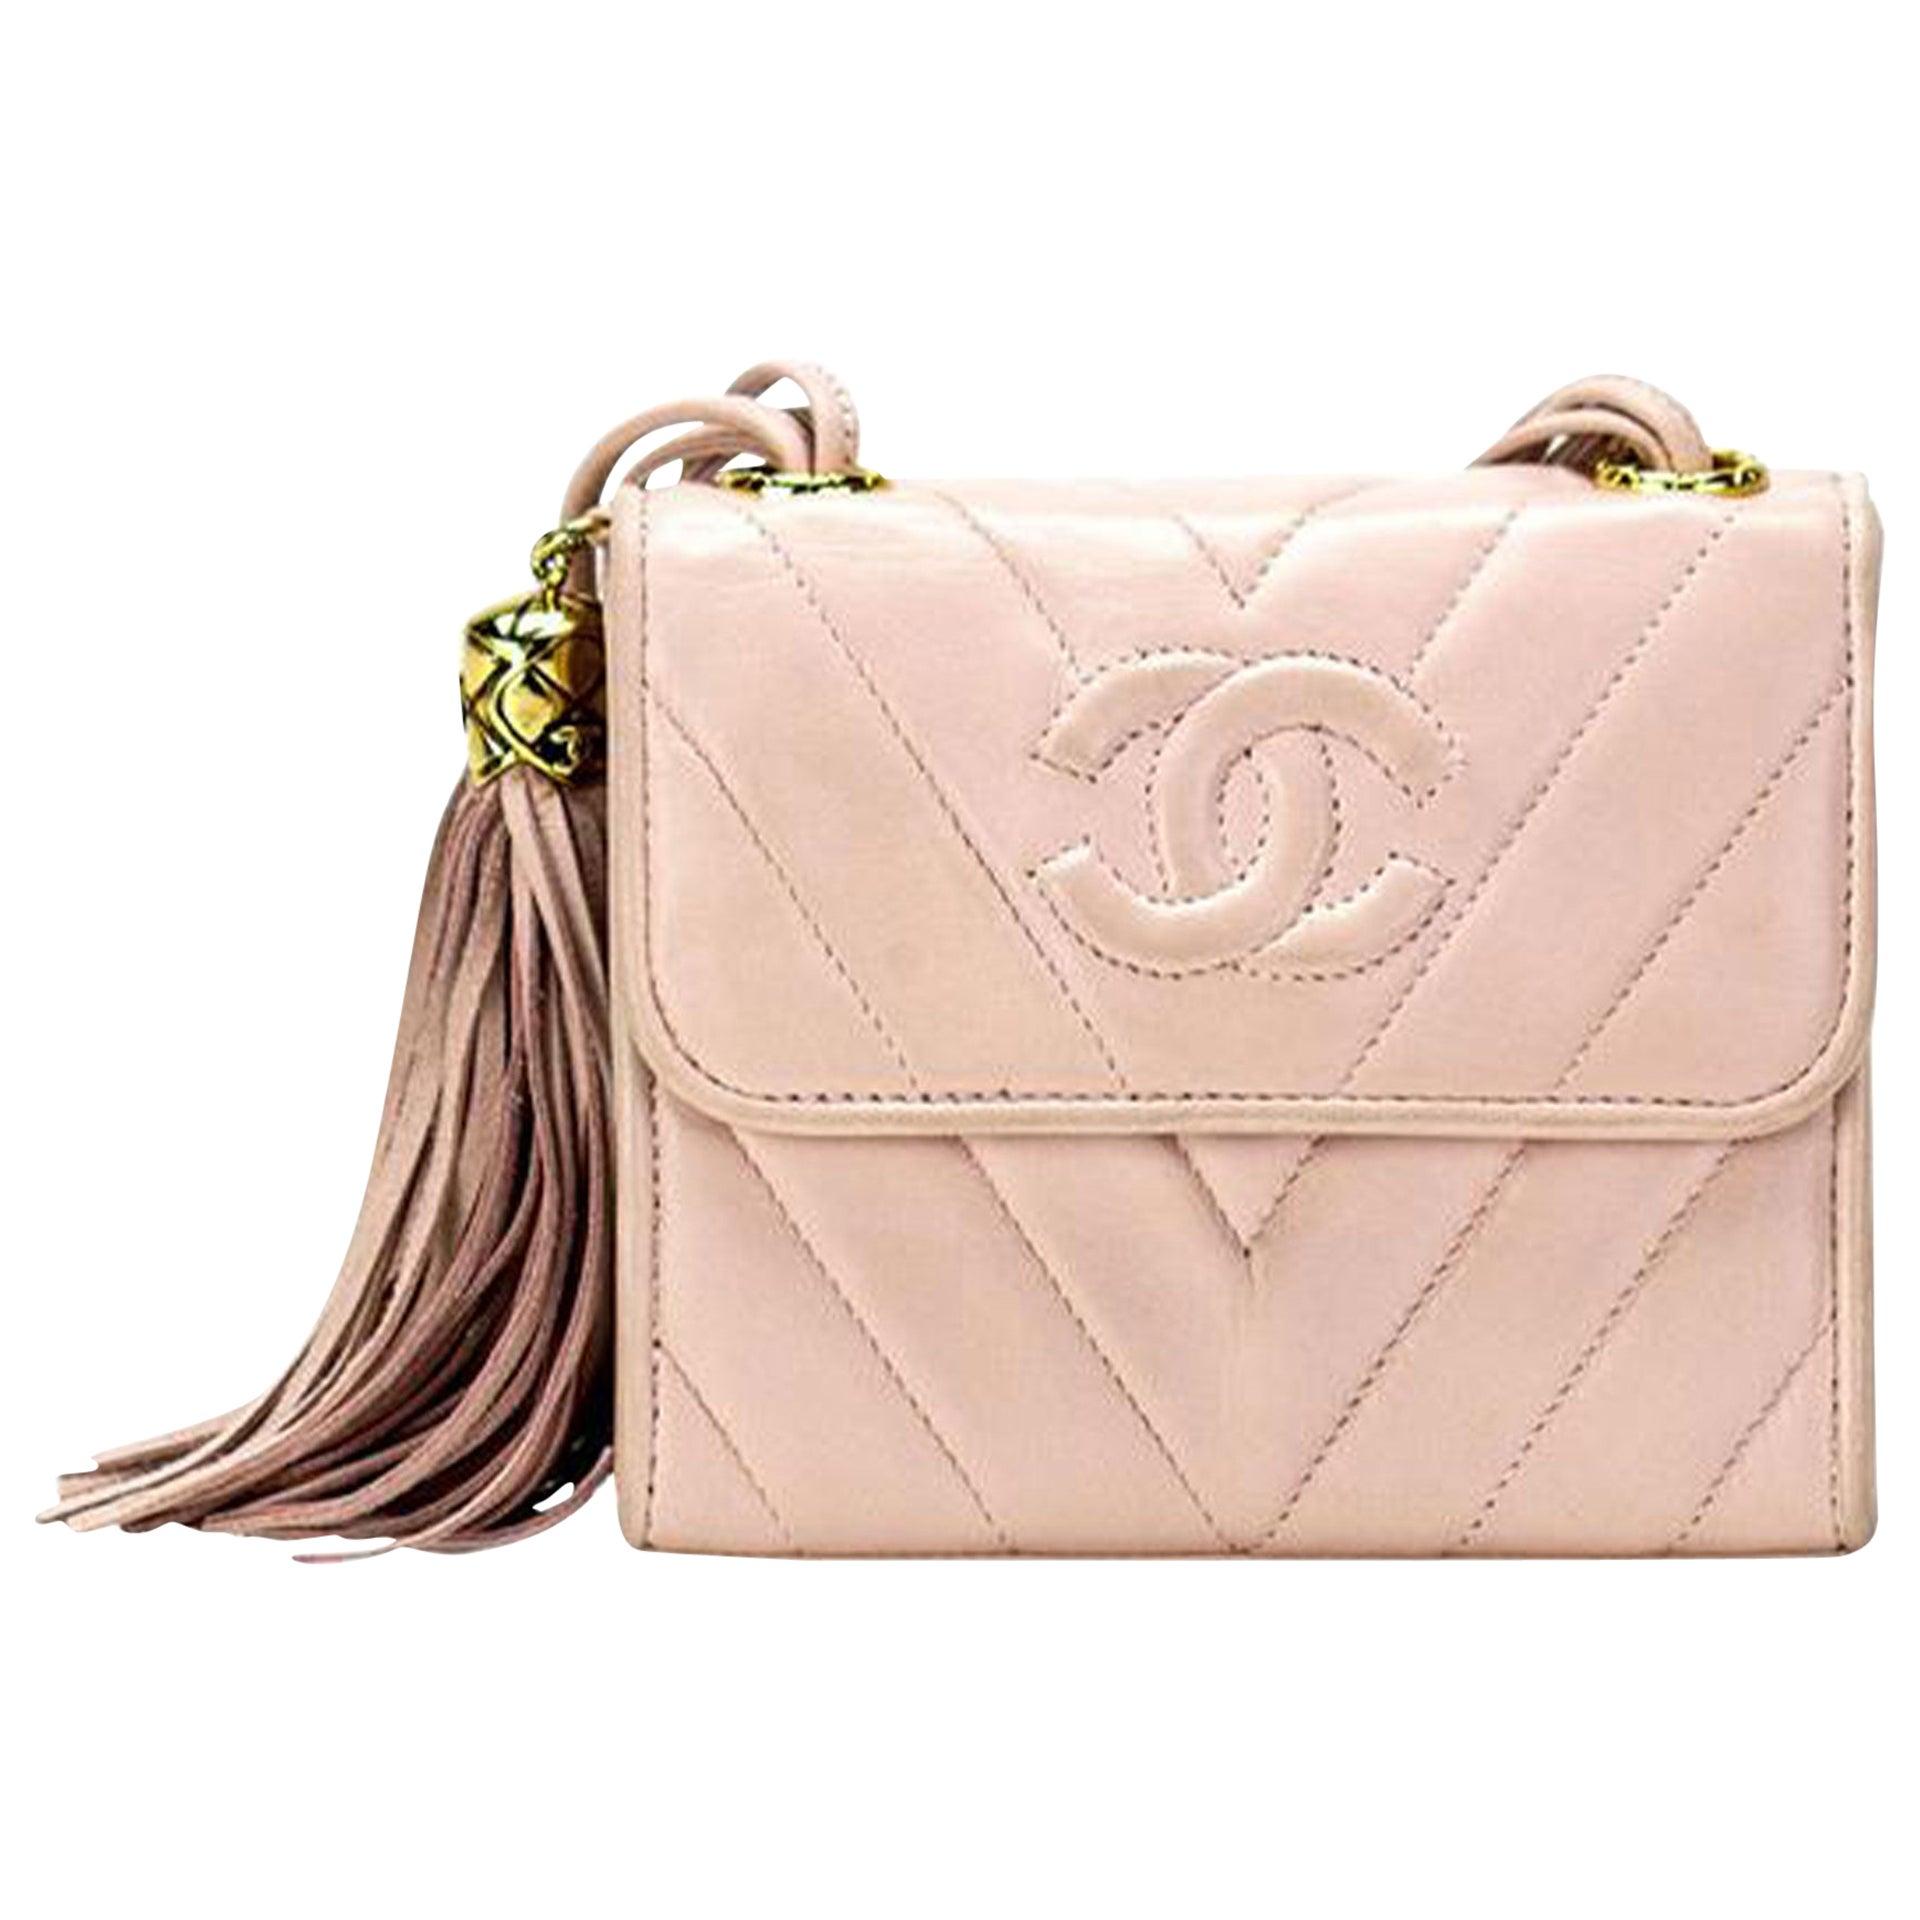 Chanel Classic Flap Vintage 90's Soft Chevron Fringe Pink Lambskin Leather Bag